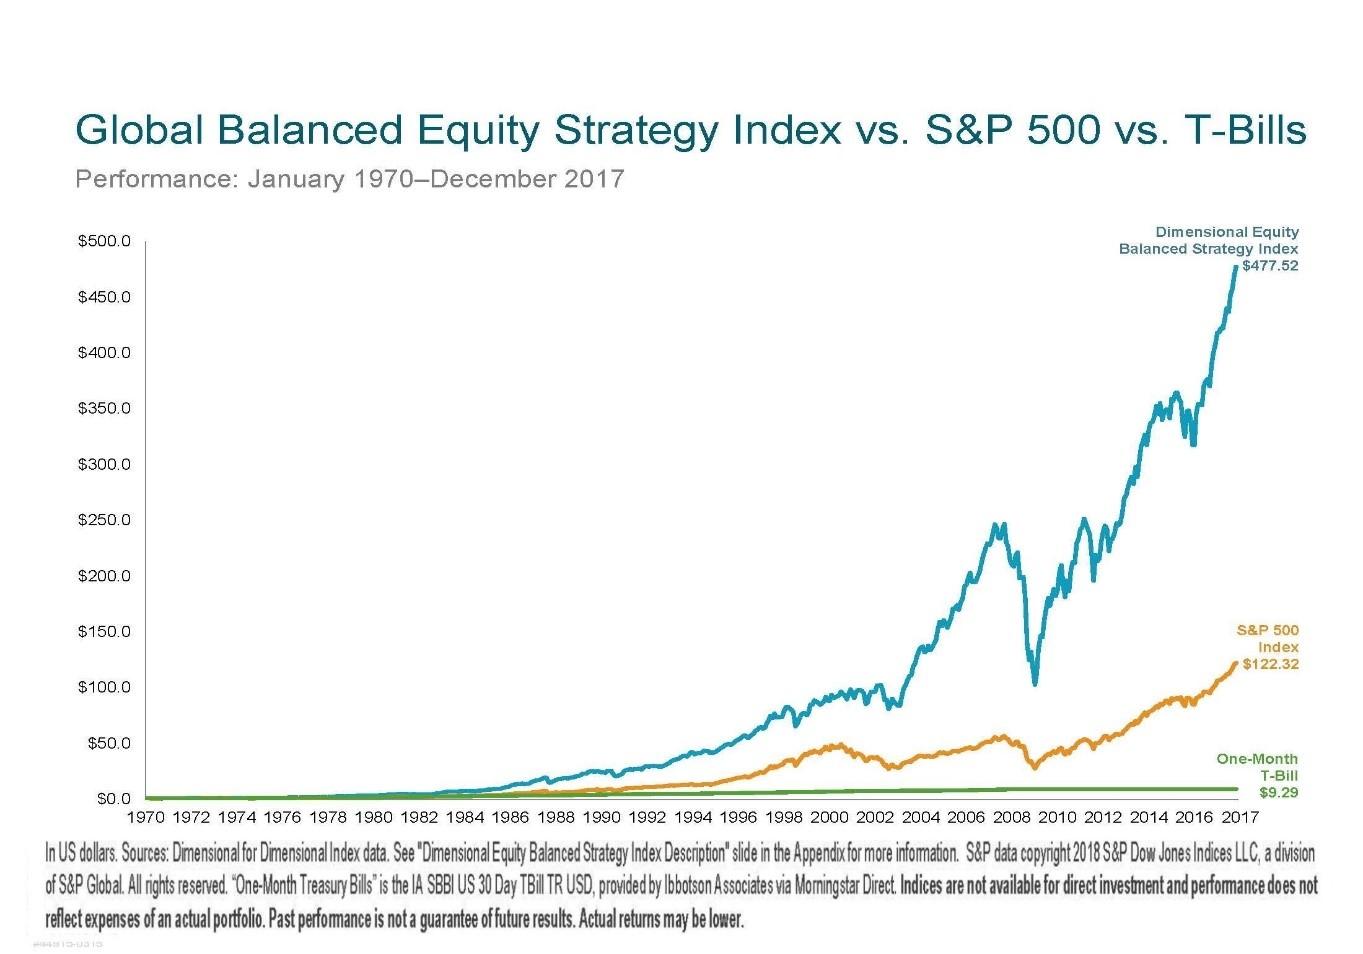 Global Balanced Equity Strategy Index vs S&P 500 vs T-Bill